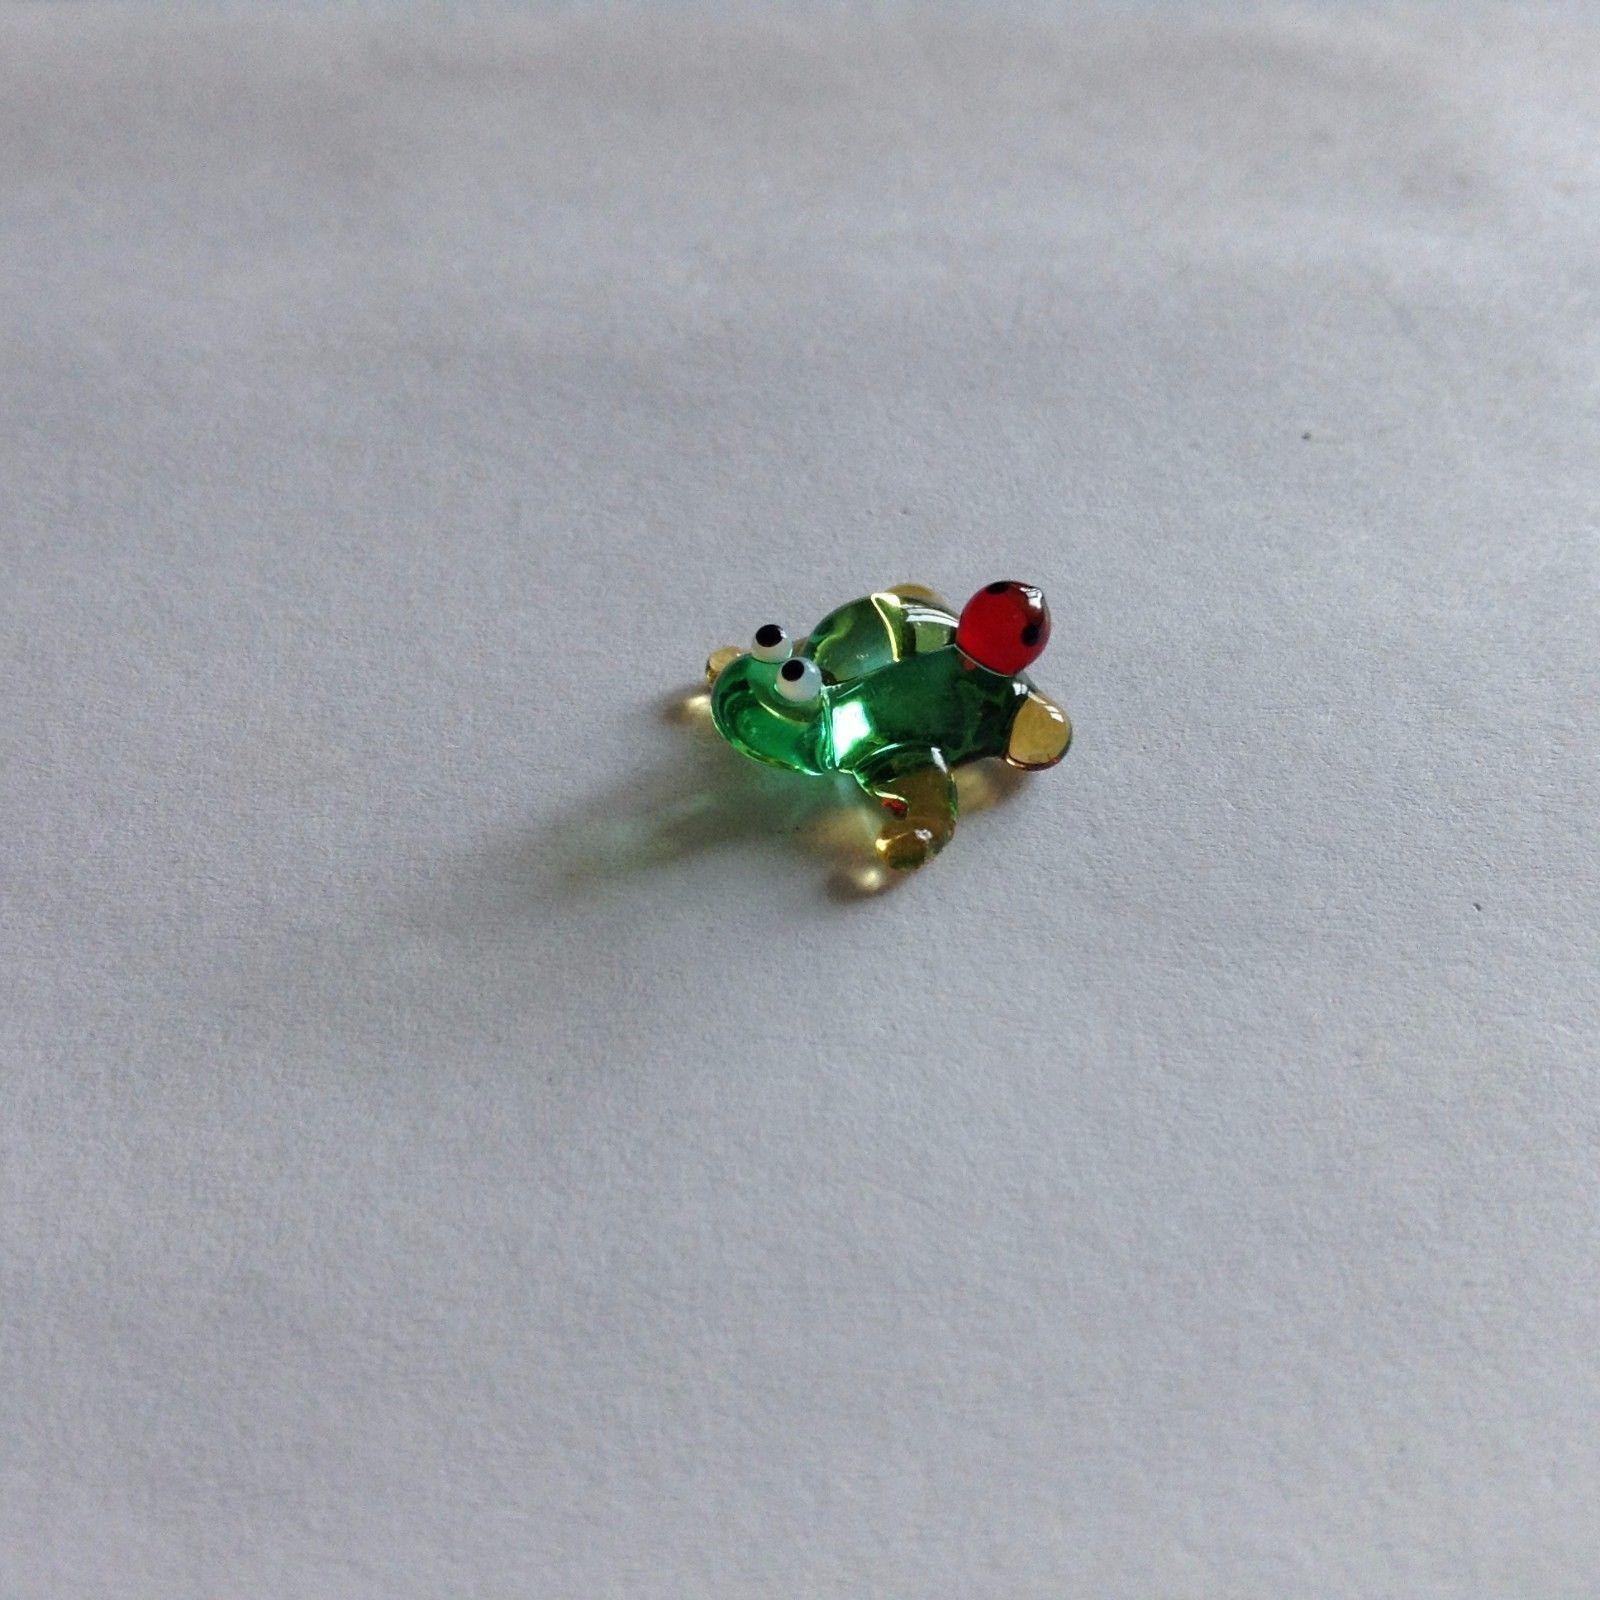 Micro miniature small hand blown glass figurine green frog w ladybug USA  NIB